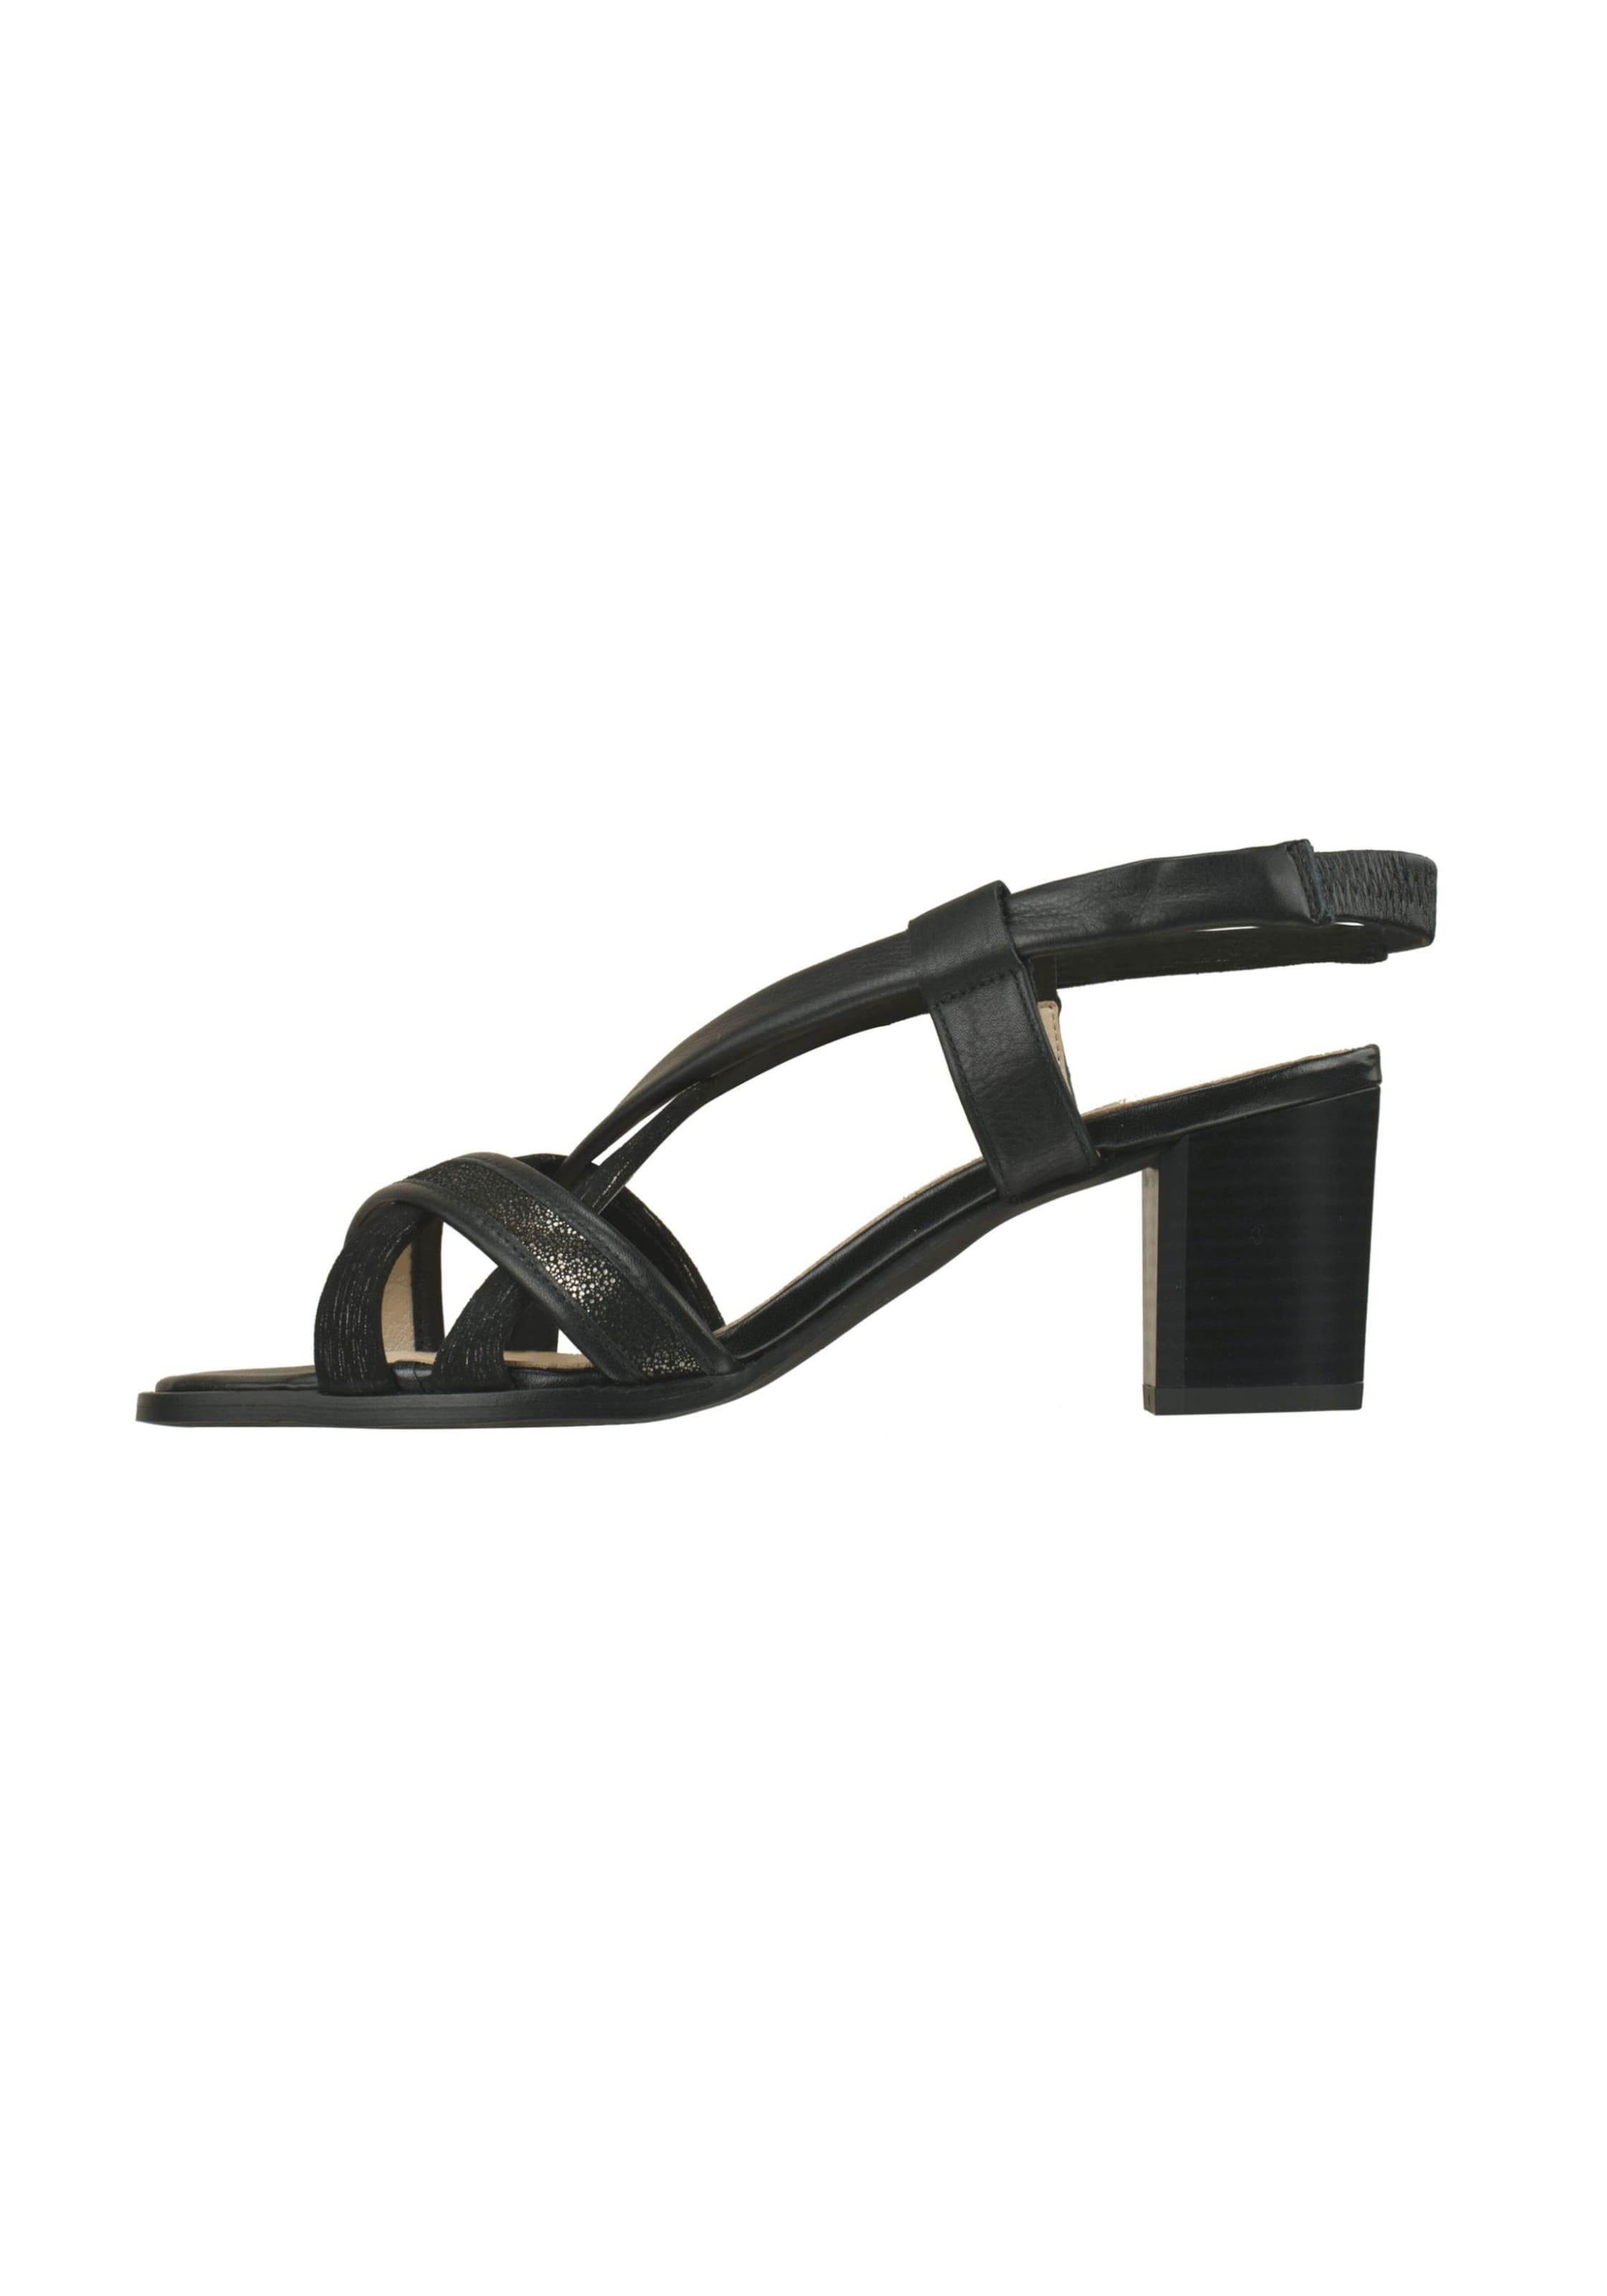 Schwarz Lei Sandalette In 'belinda' By Tessamino LSUqGpzMV